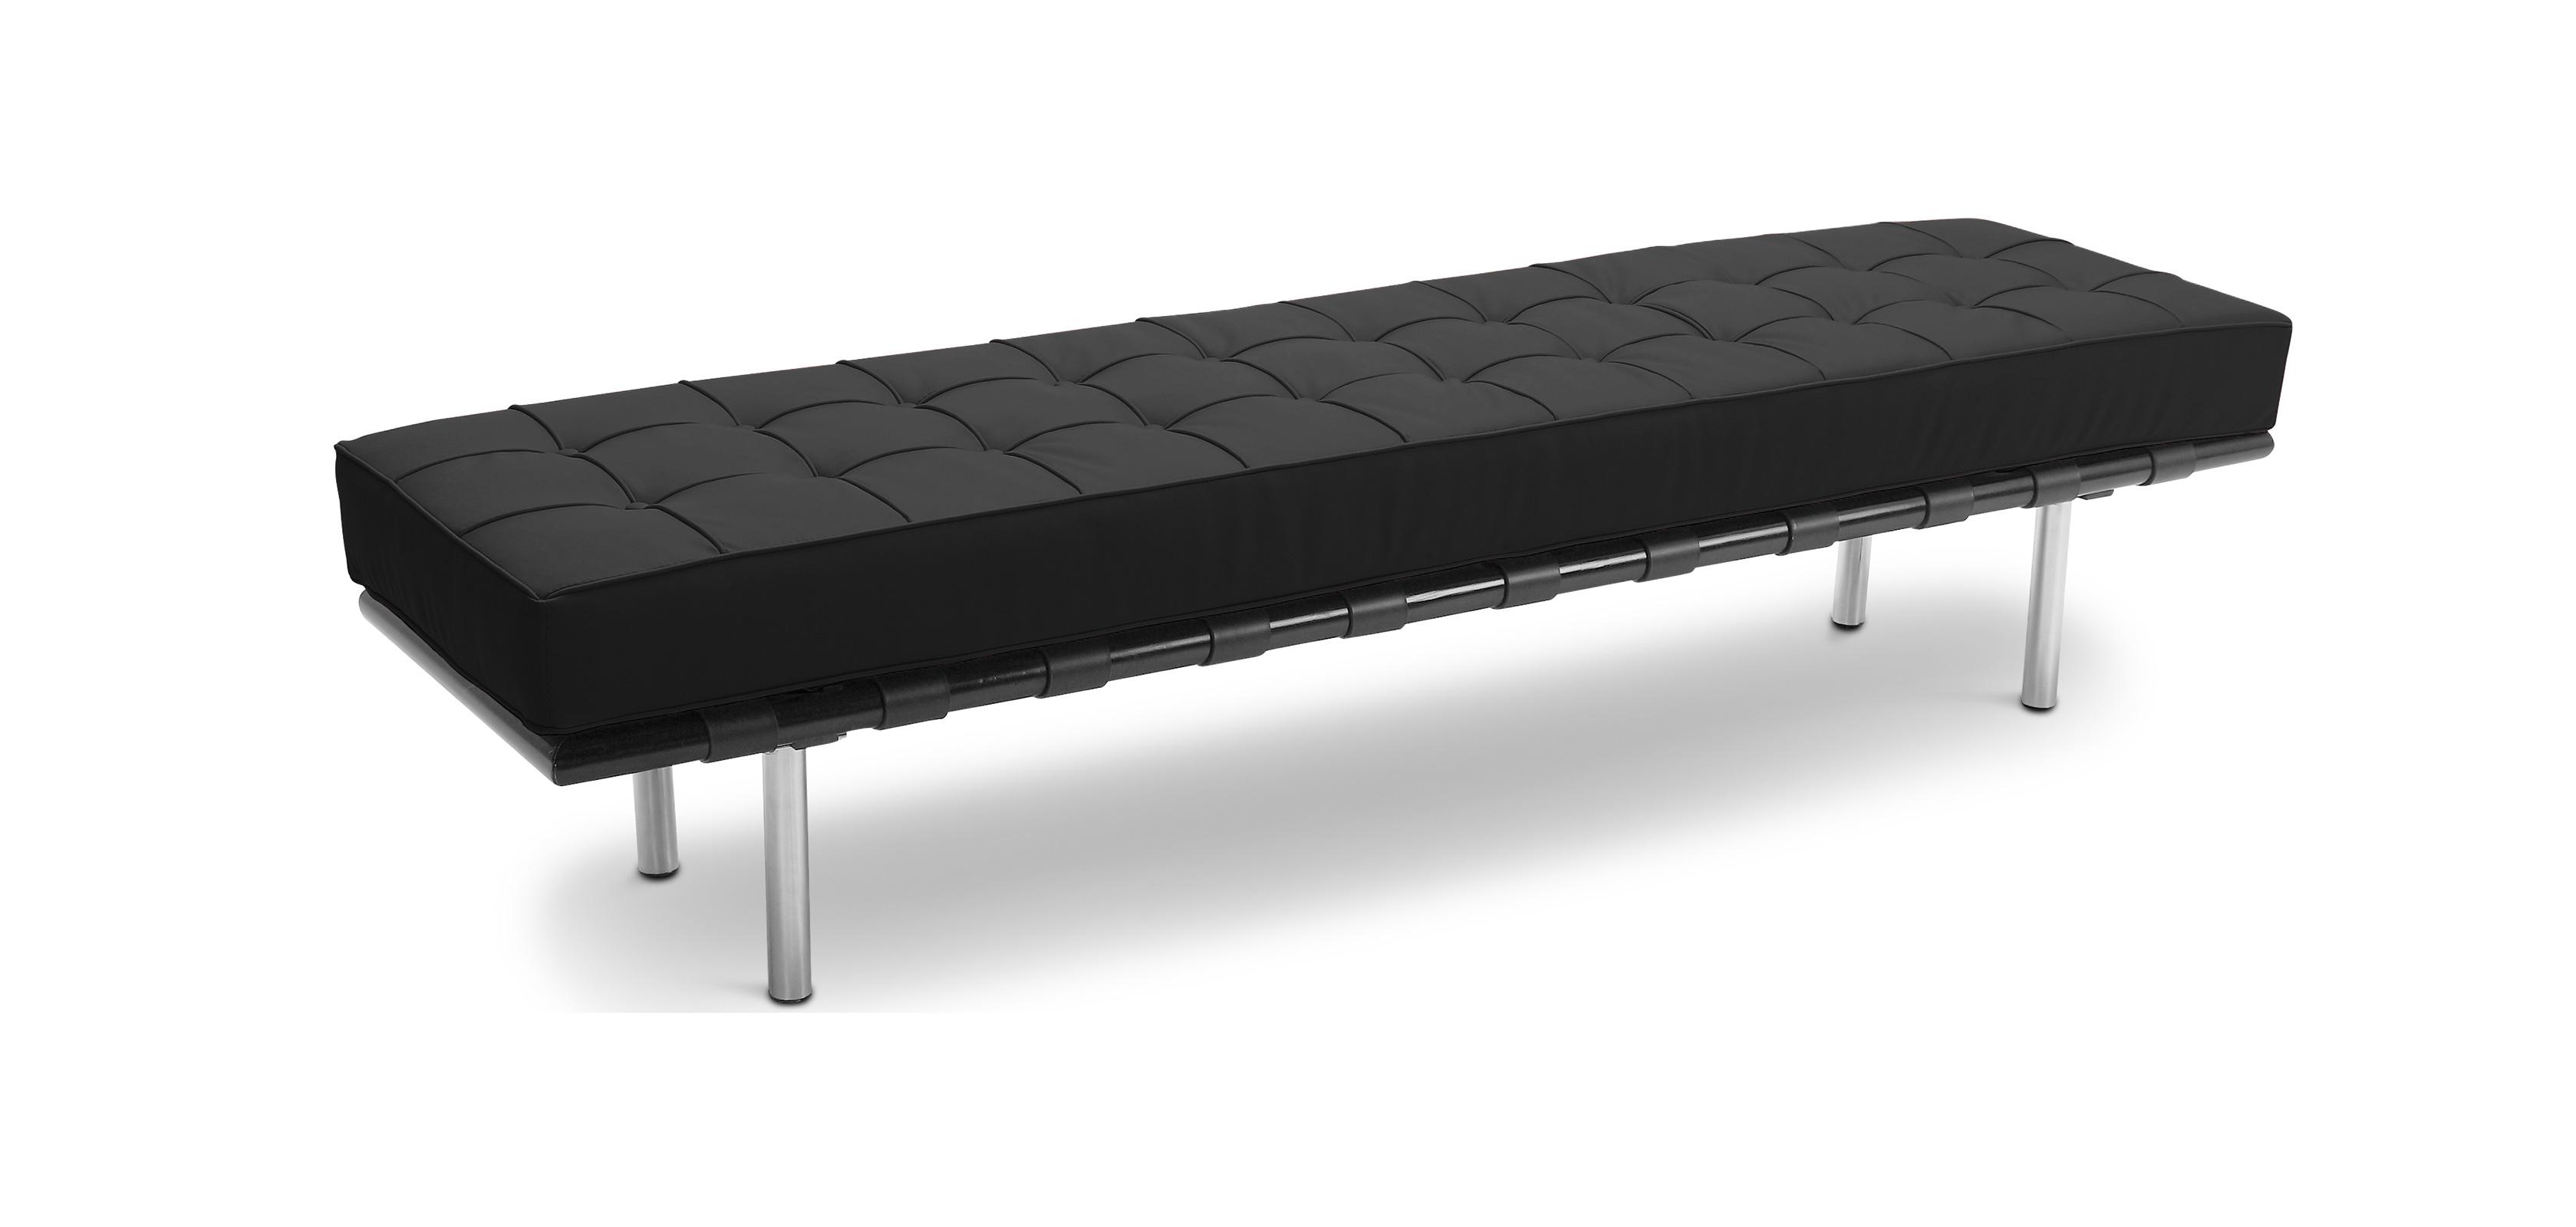 banc barcelona ludwig mies van der rohe simili cuir. Black Bedroom Furniture Sets. Home Design Ideas